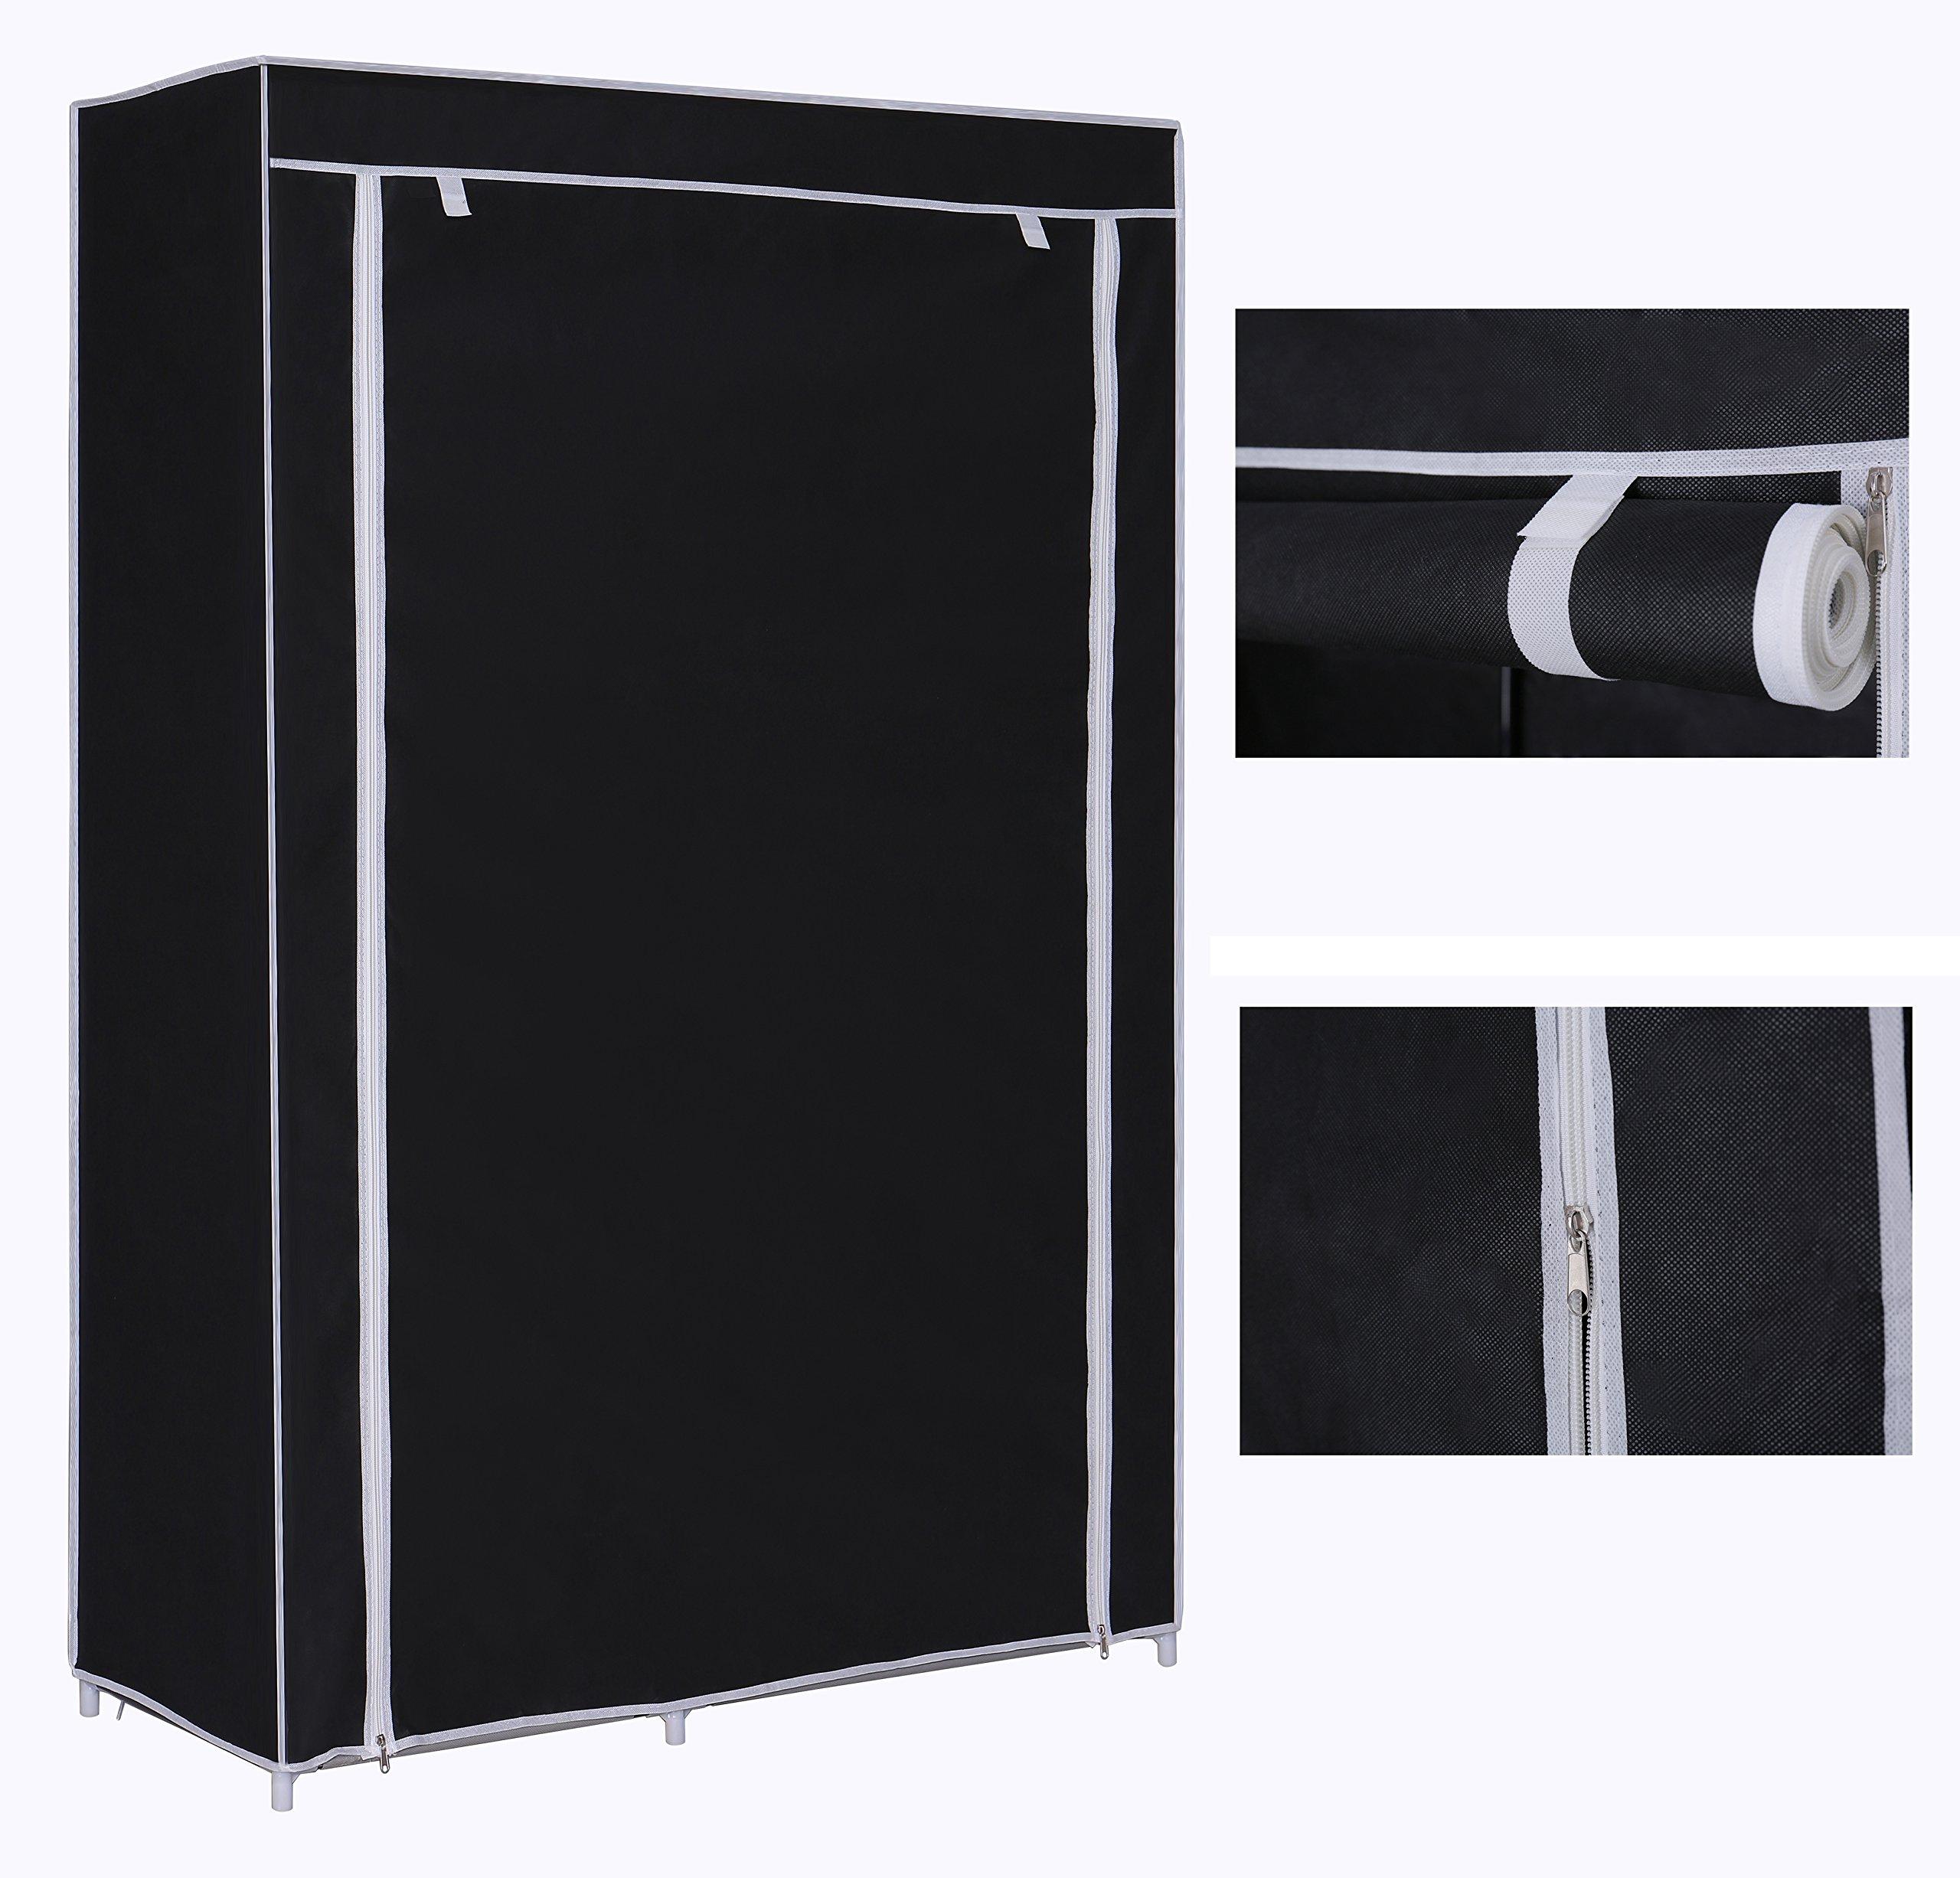 Home Like Portable Cloth Closet Storage Wardrobe Armoire Temporary Closet  Handy Clothes Closets Non Woven Fabric Wardrobe Clothing Storage Organizer  Black ...